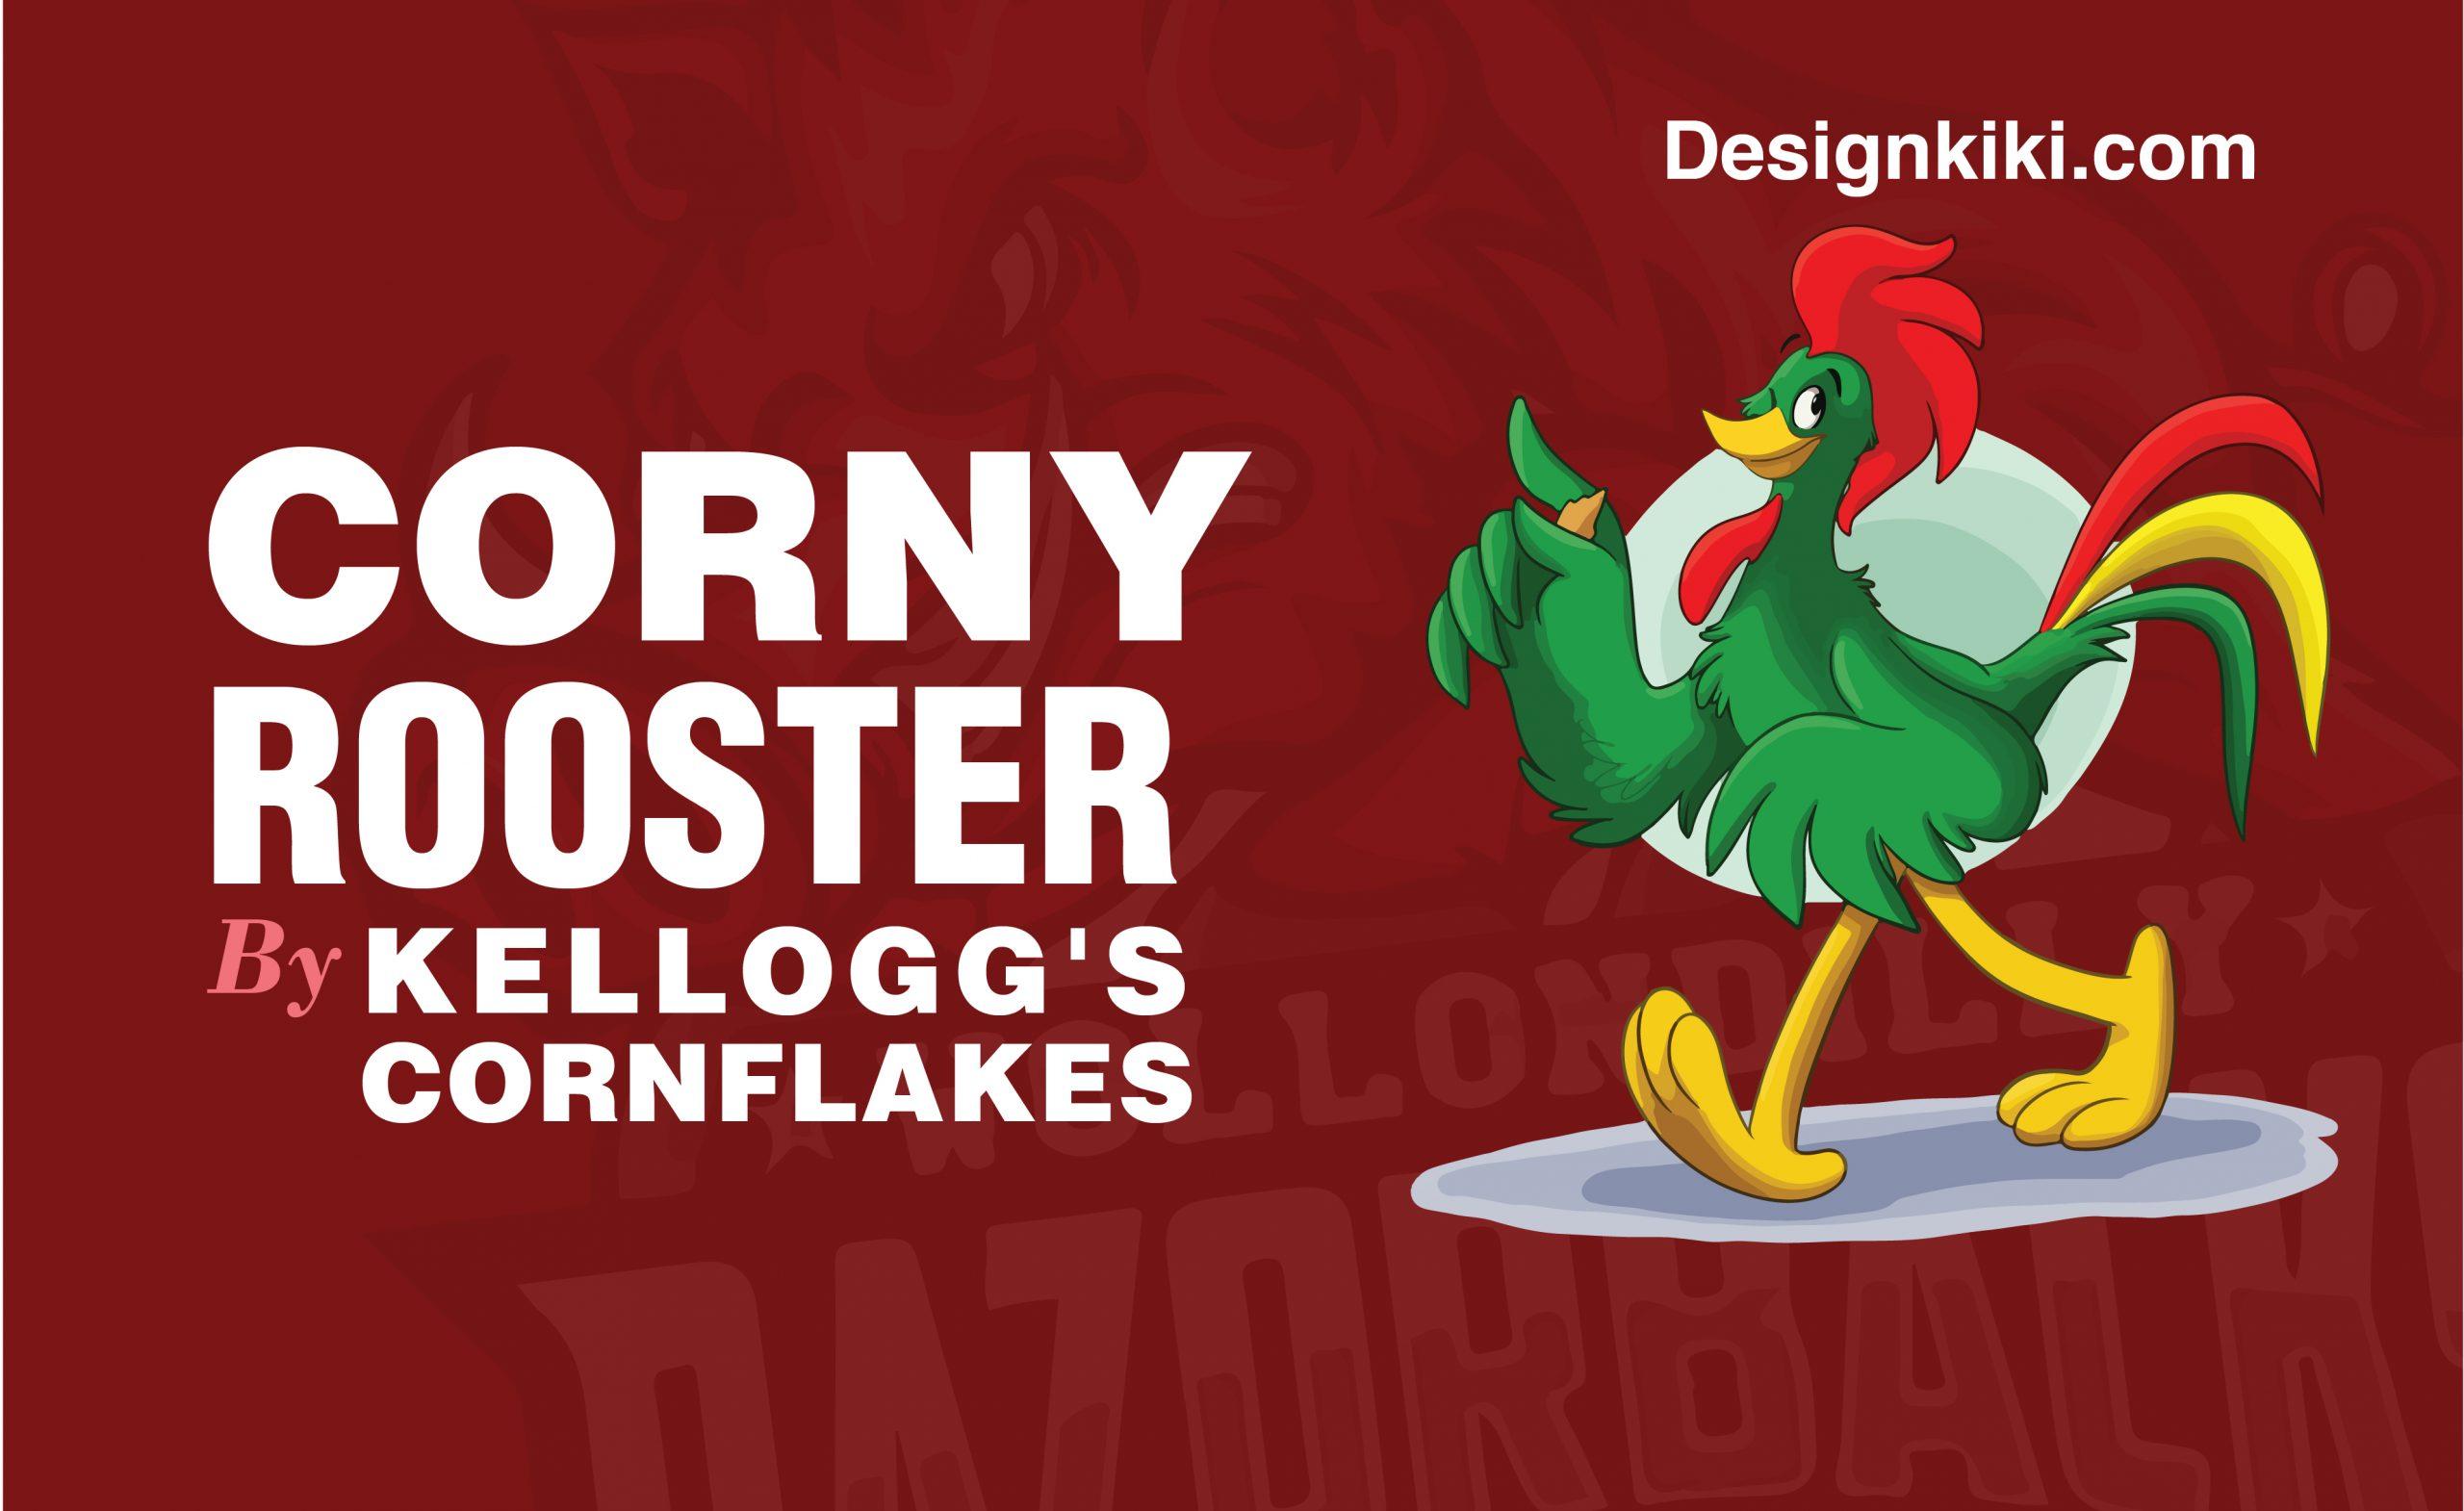 Kellogg's mascot logos